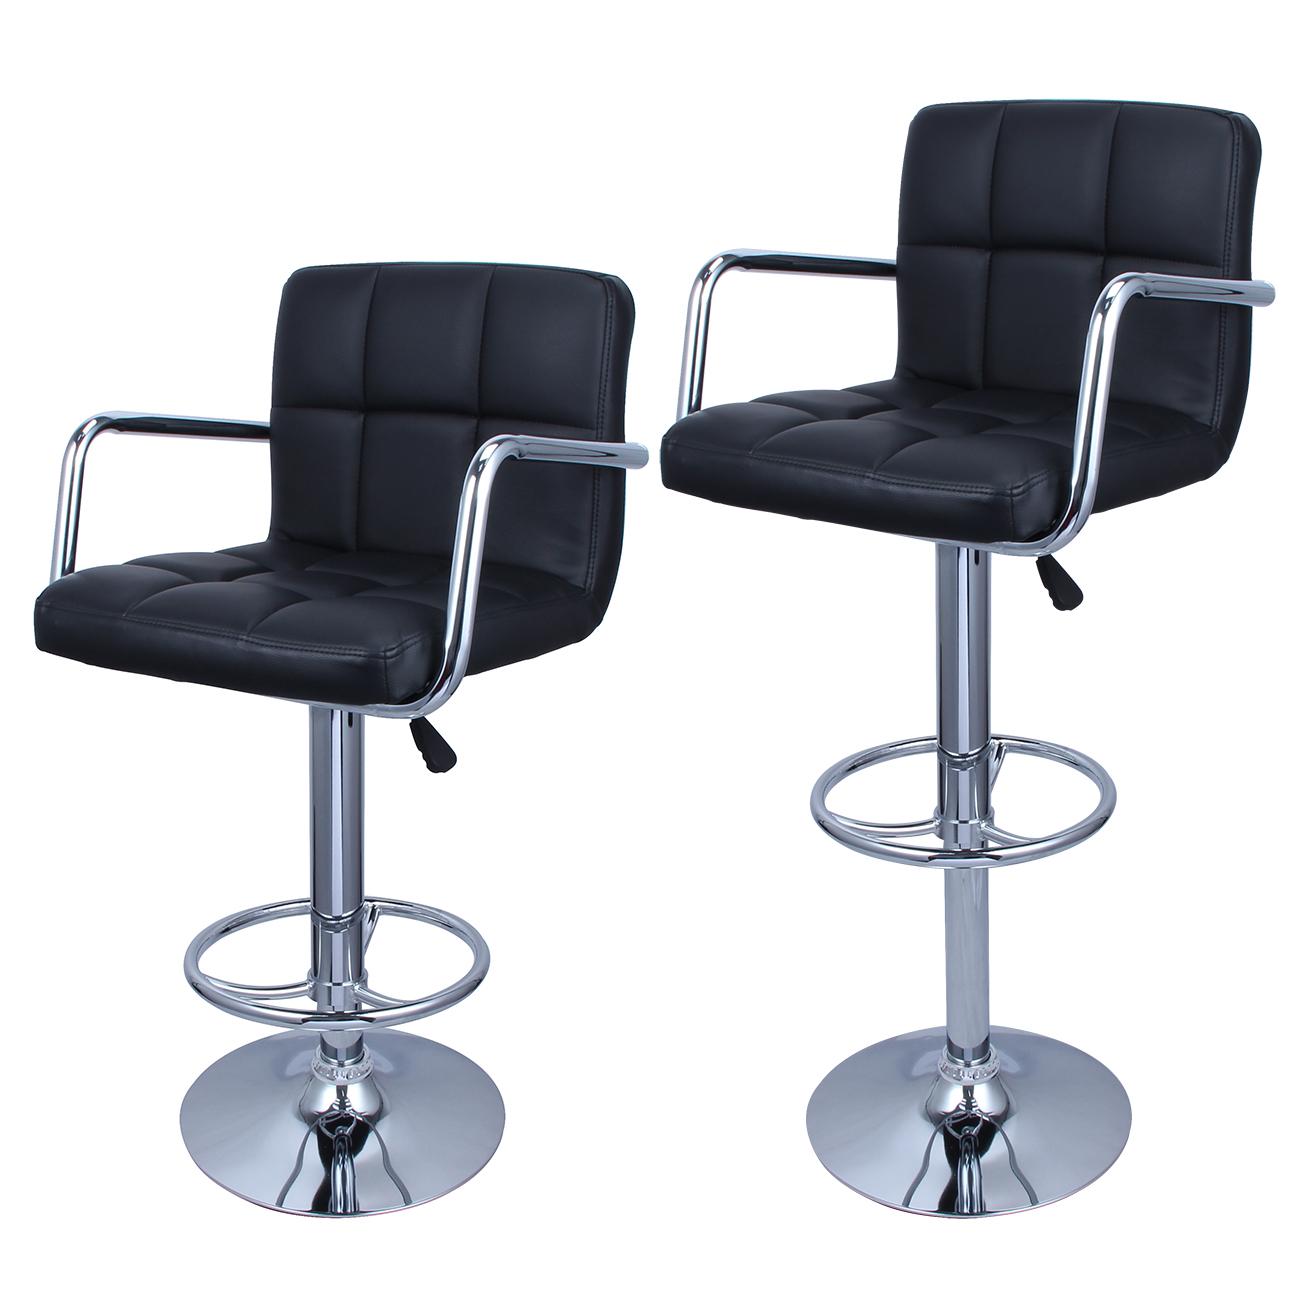 2 Black PU Leather Modern Design Adjustable Swivel  : 048 gm 481161 from www.ebay.com size 1300 x 1300 jpeg 500kB